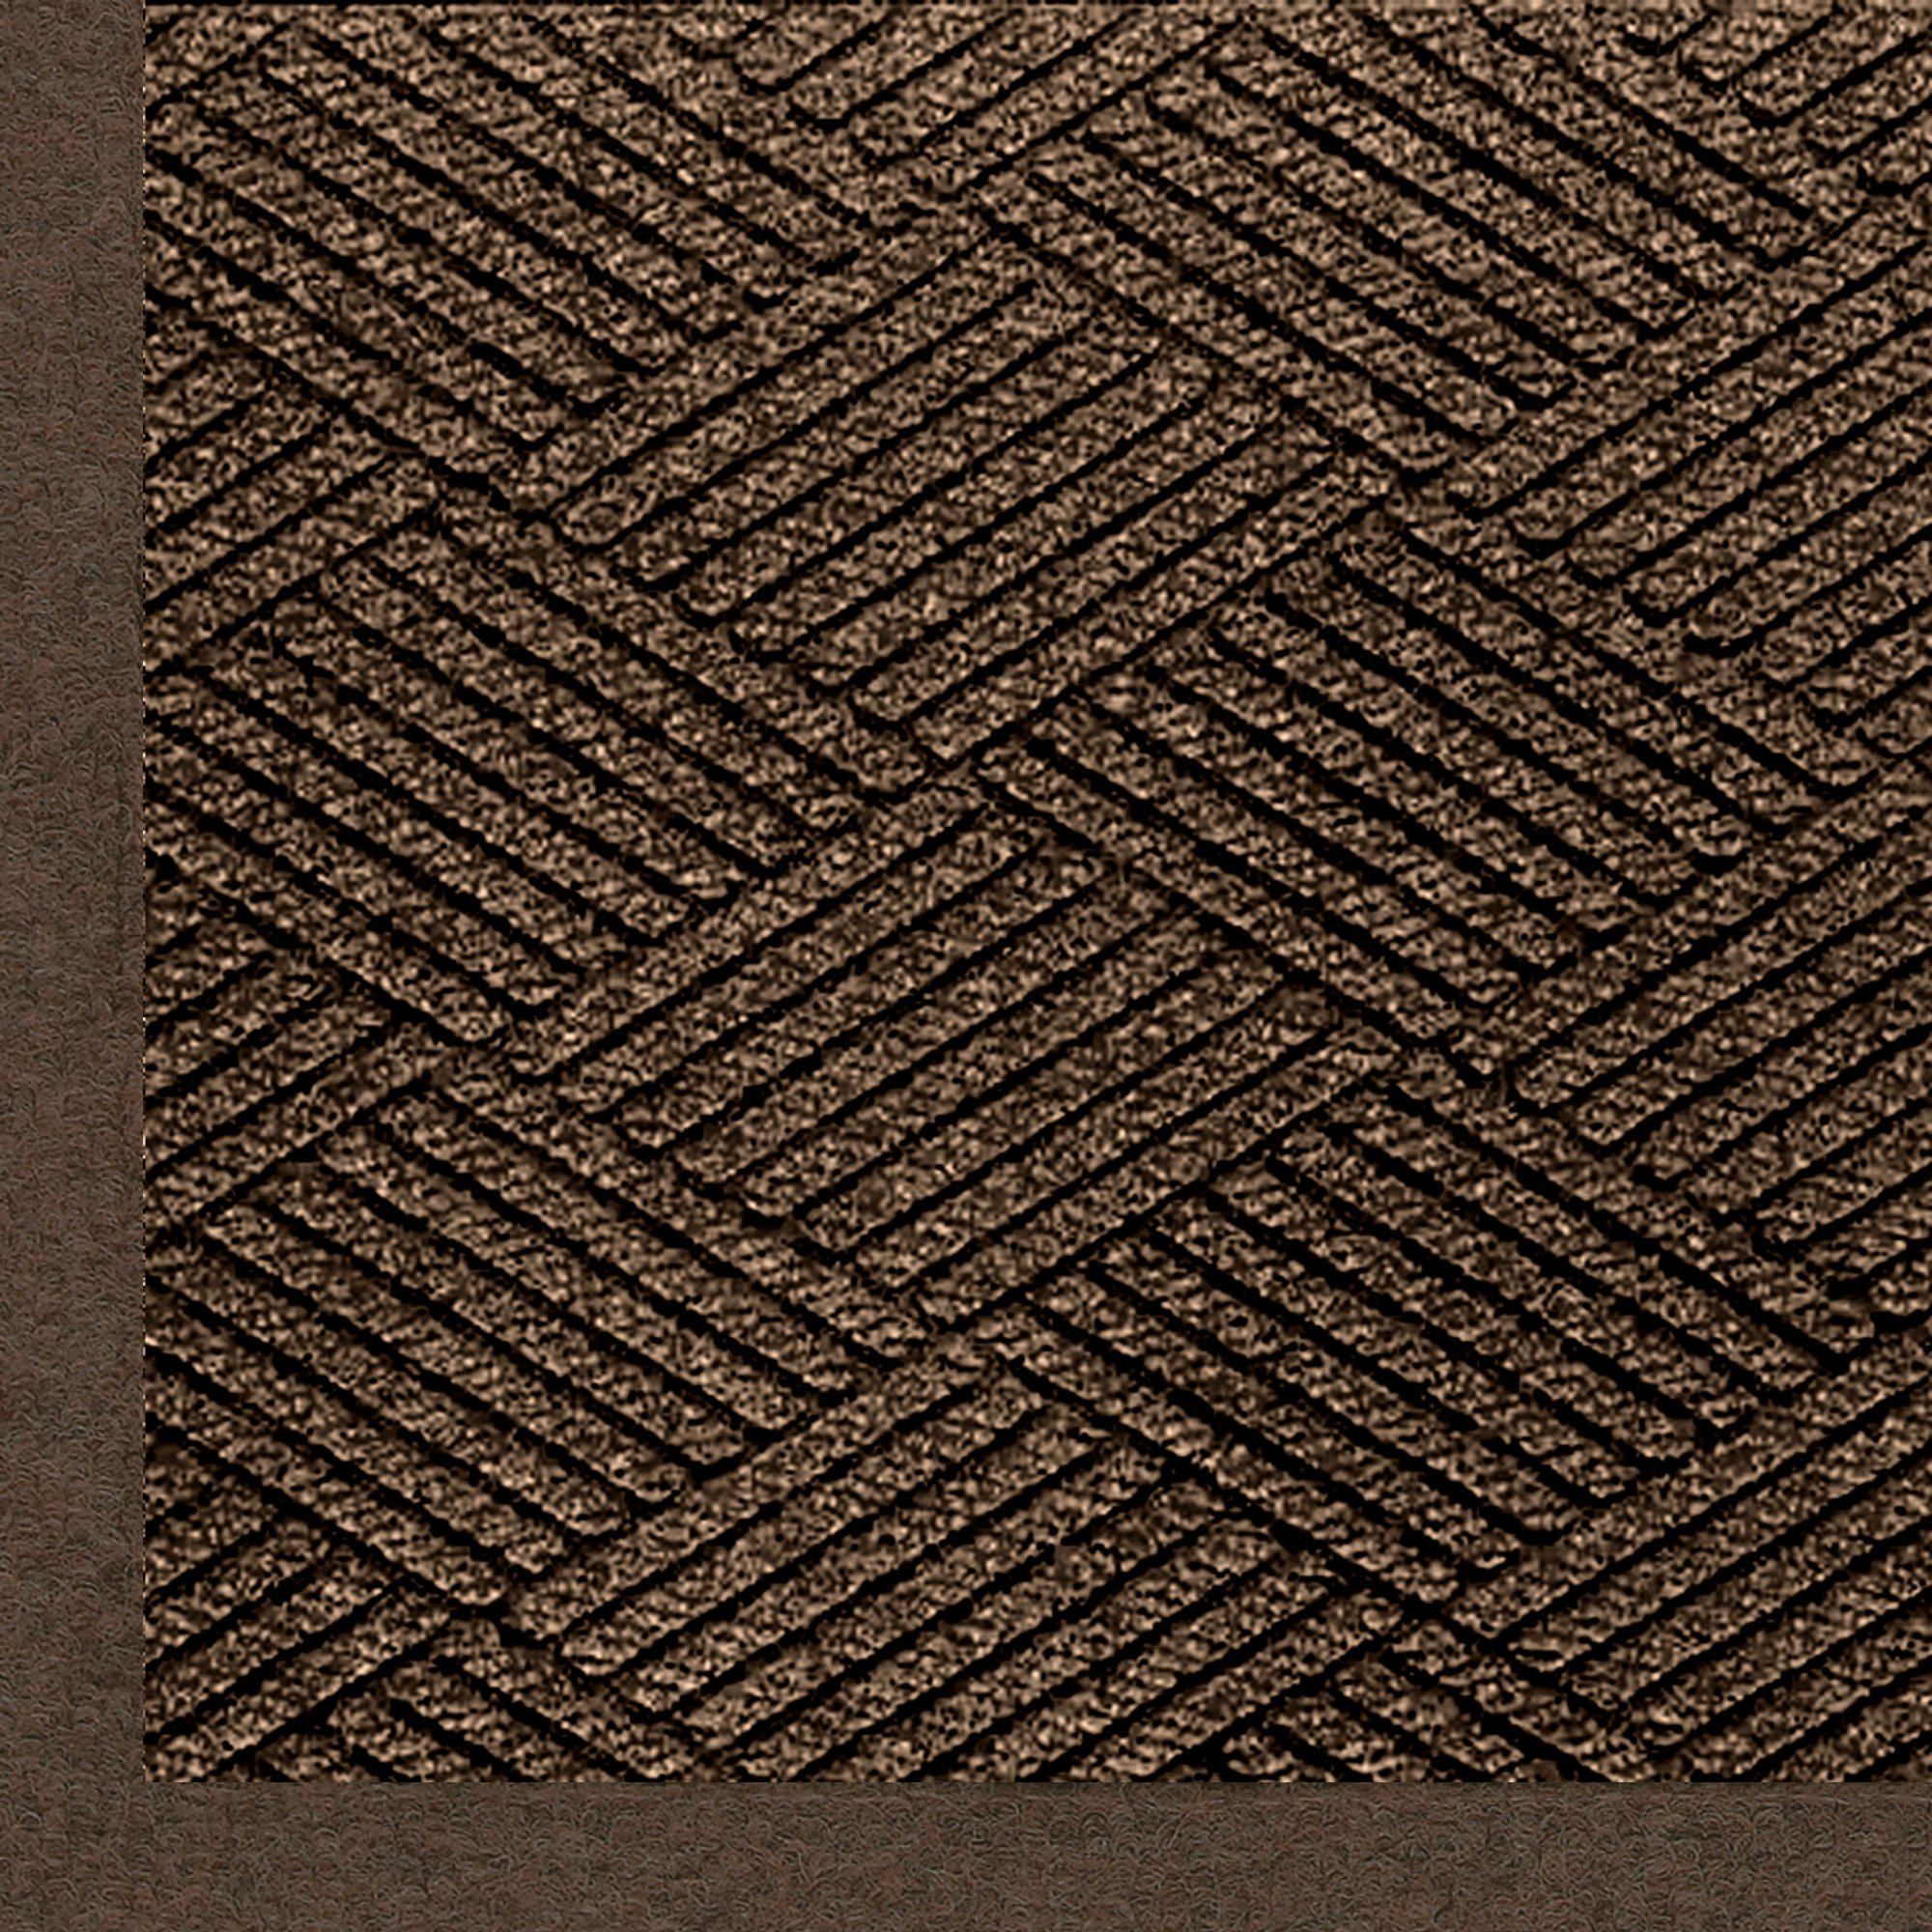 M+A Matting 2297 Waterhog Eco Premier Fashion PET Polyester Fiber Indoor/Outdoor Floor Mat, SBR Rubber Backing, 8.4' Length x 4' Width, 3/8'' Thick, Chestnut Brown